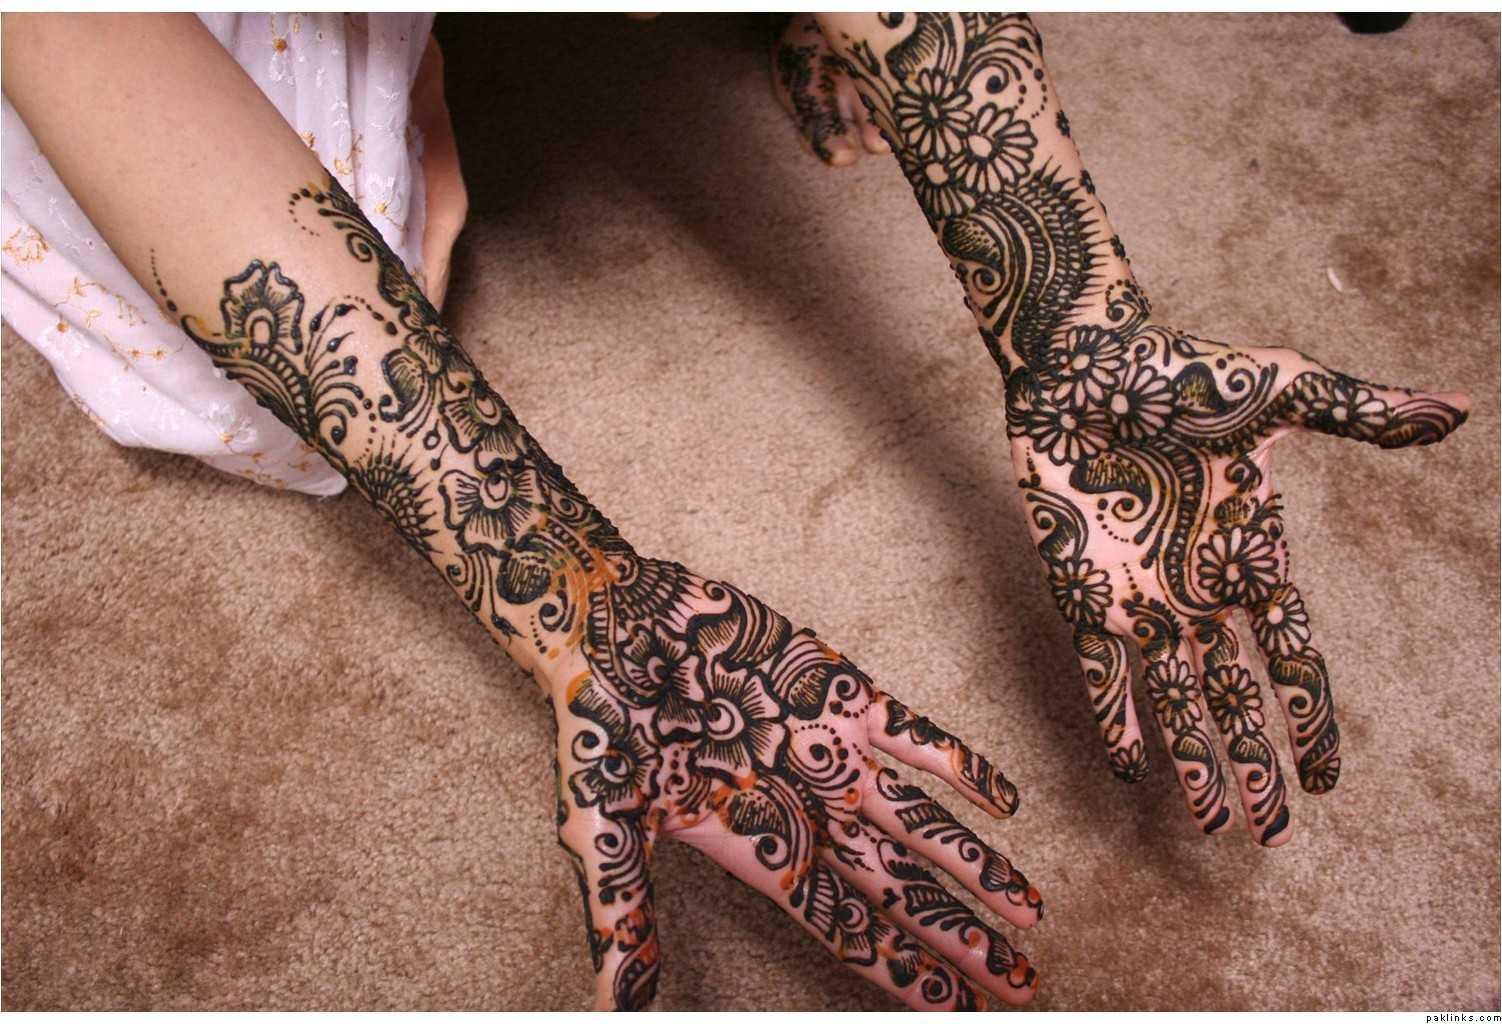 Dulhan Mehndi Designs For Full Hands 2014 : Cool latest bridal mehndi designs for hands